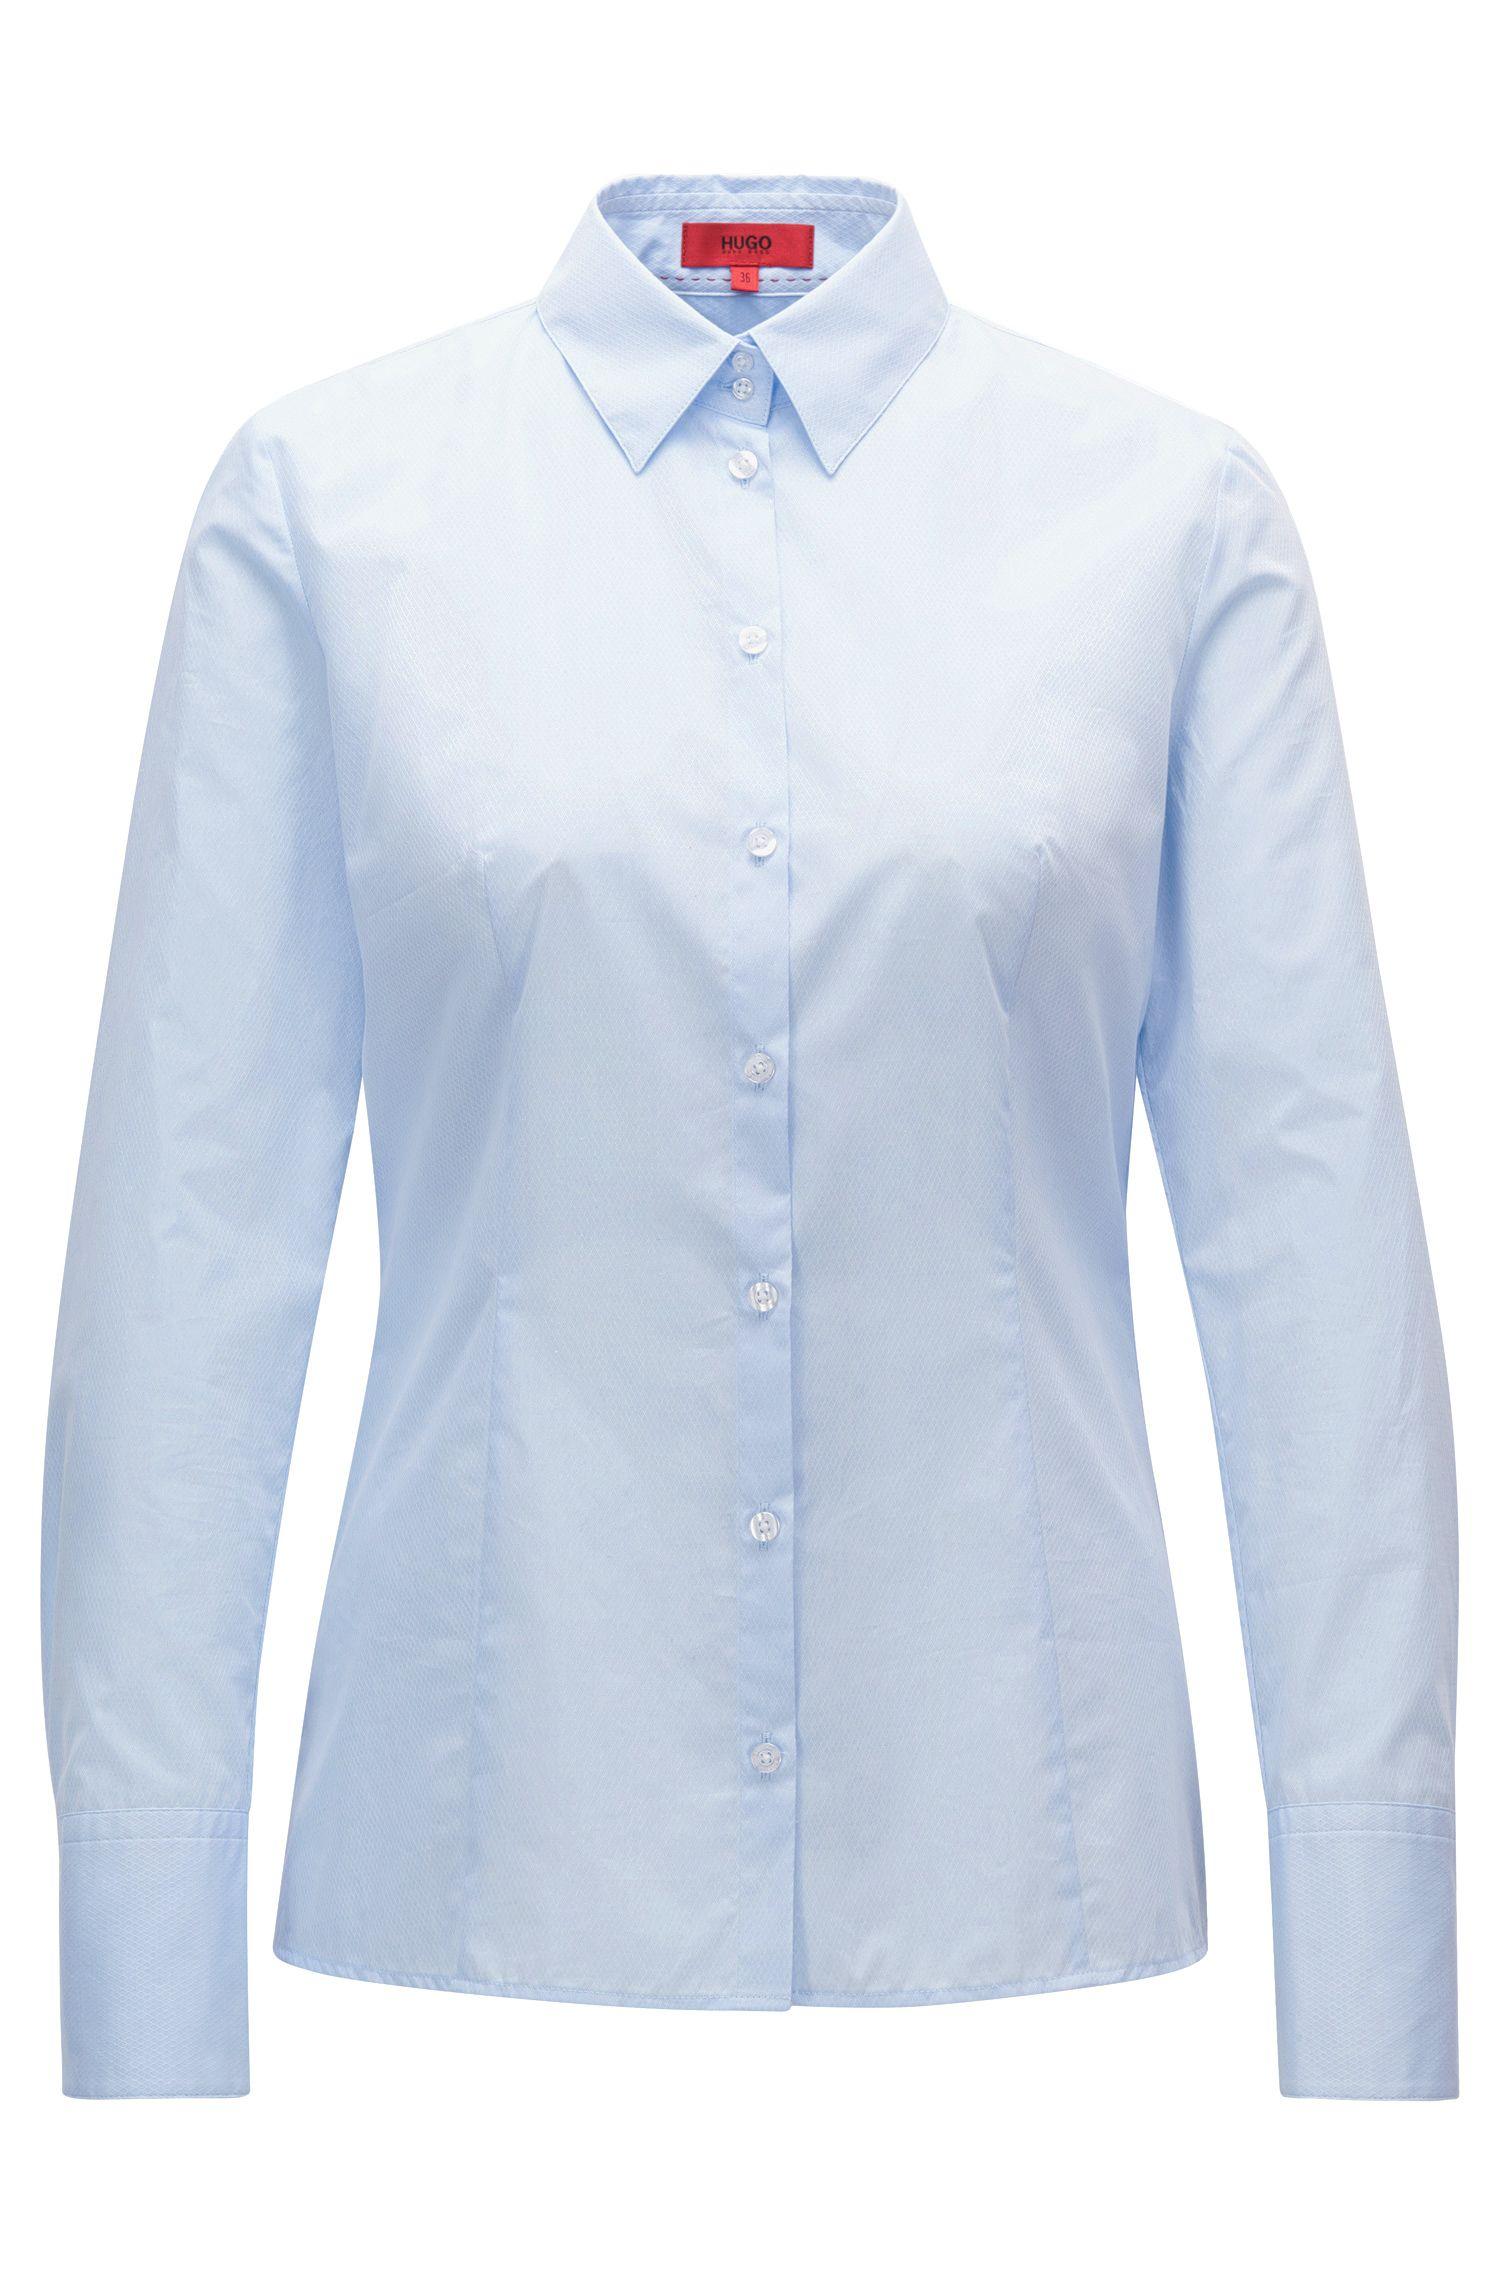 Blusa slim fit en algodón de tejido dobby